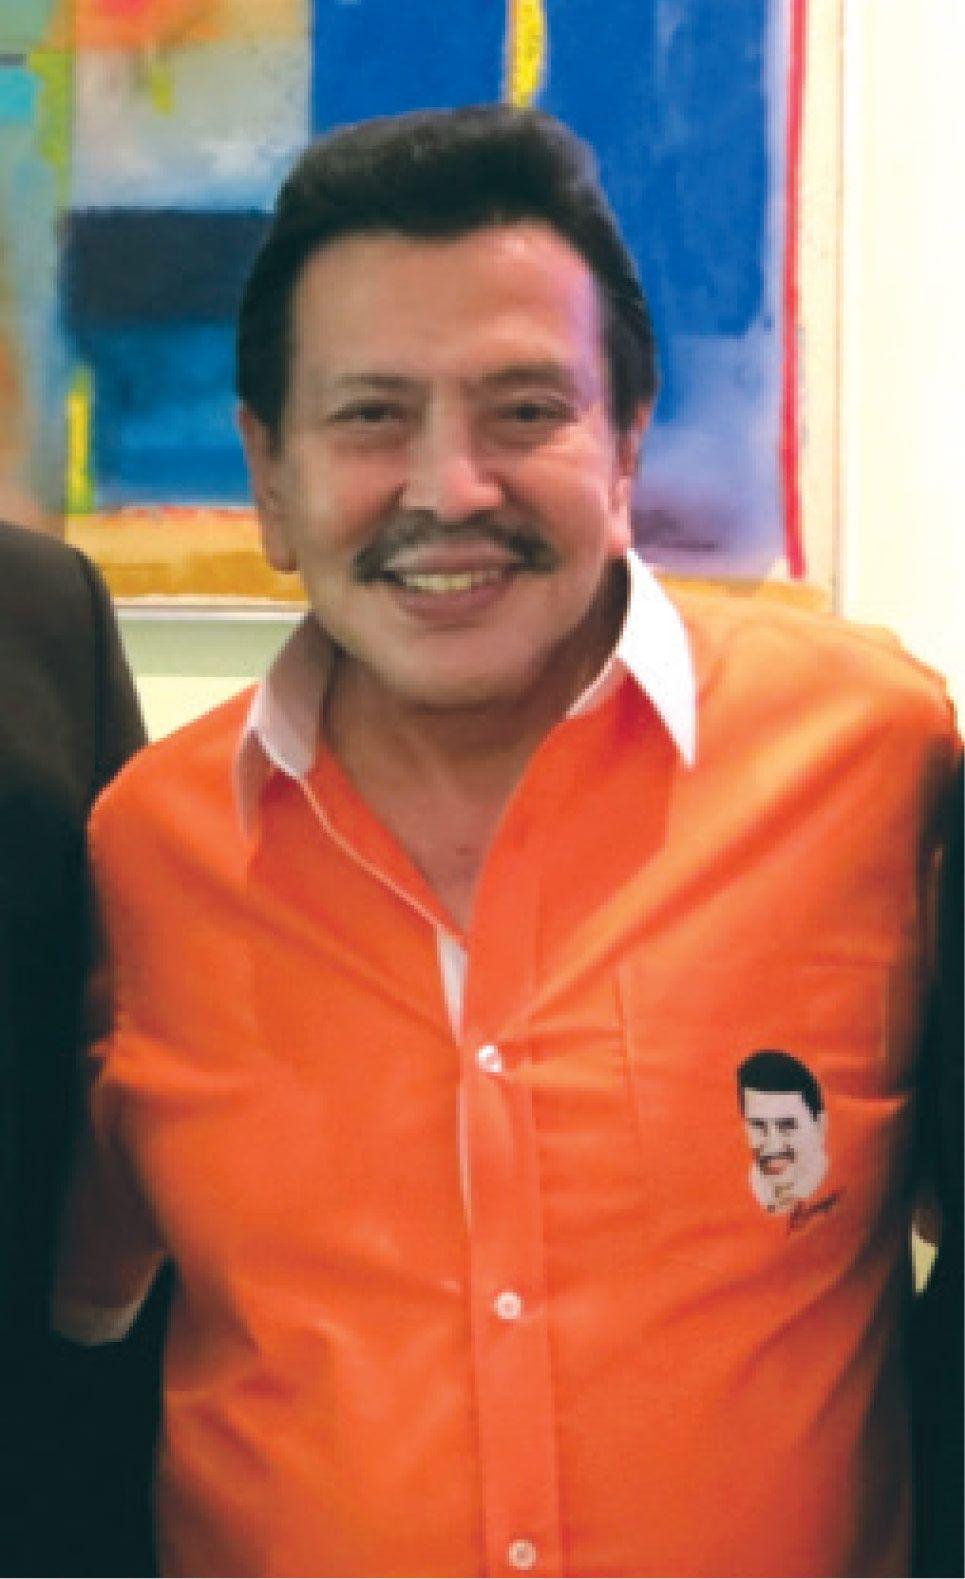 EW Villa Medica Success Case - ANTI AGING - JOSEPH ESTRADA